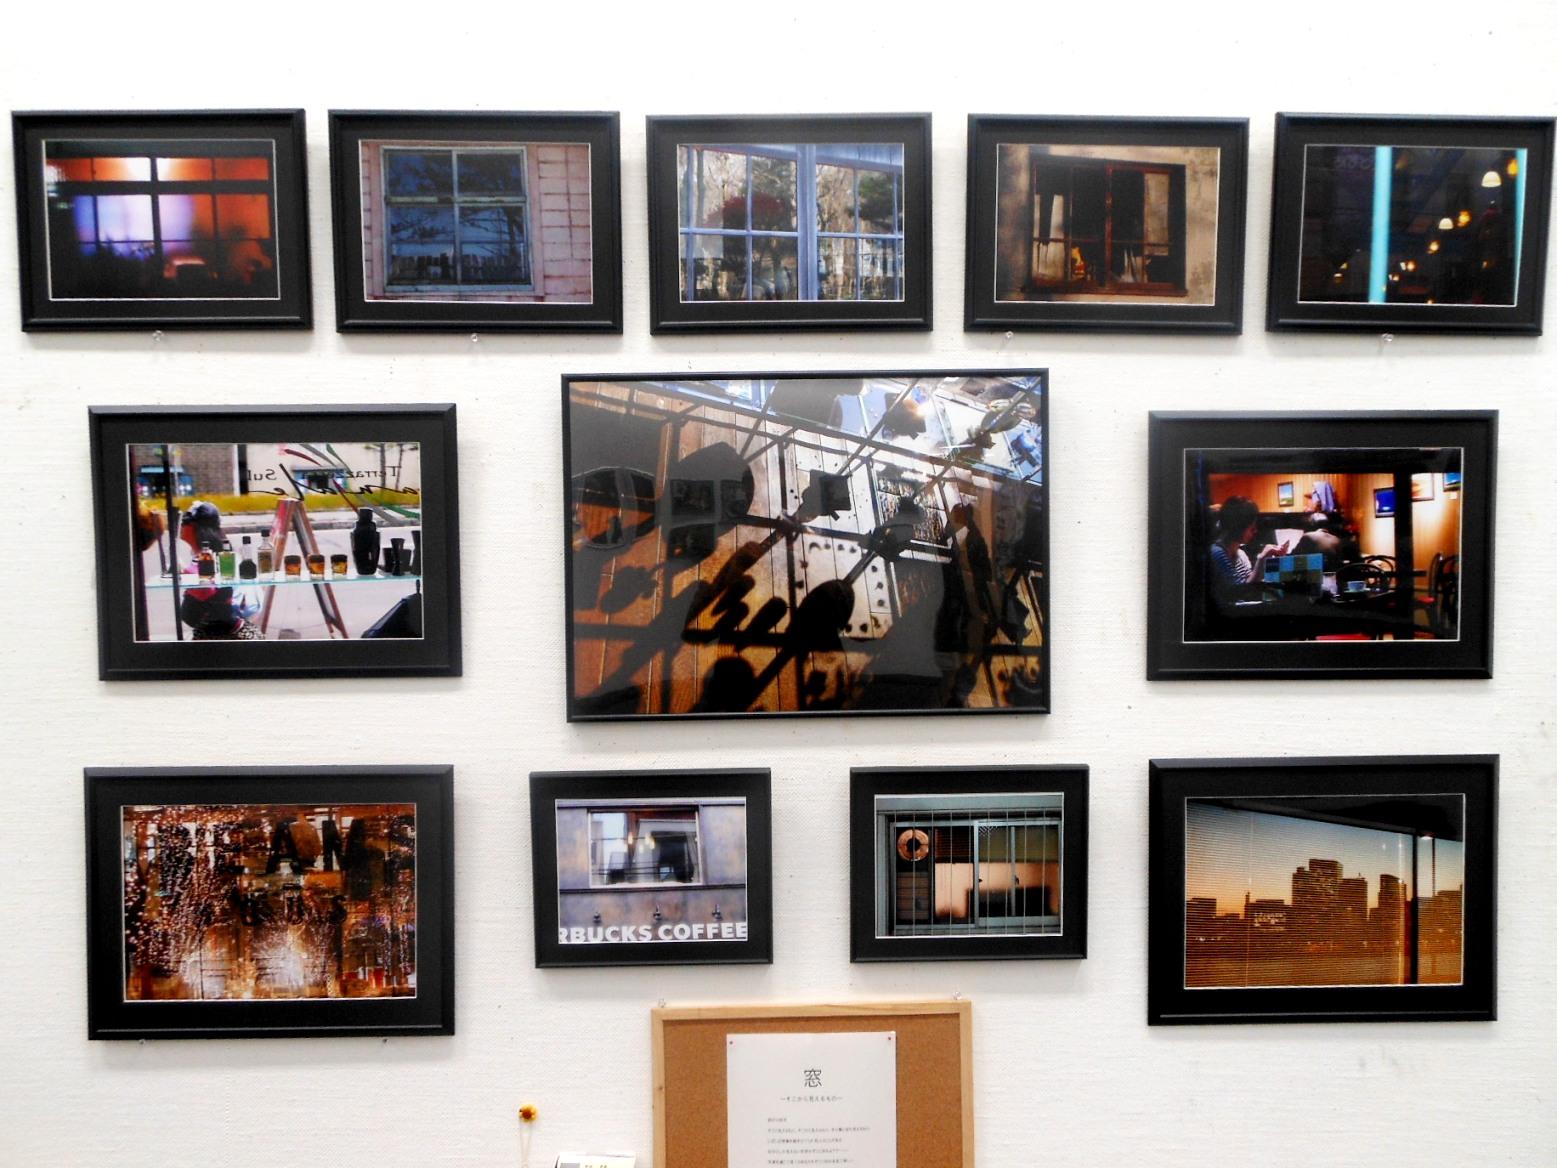 1885)②「写真クラブ「BePHaT!!」 第9回作品展 『夢 Photo 2012』」市民g. 終了11月21日(水)~11月25日(日)_f0126829_22352019.jpg